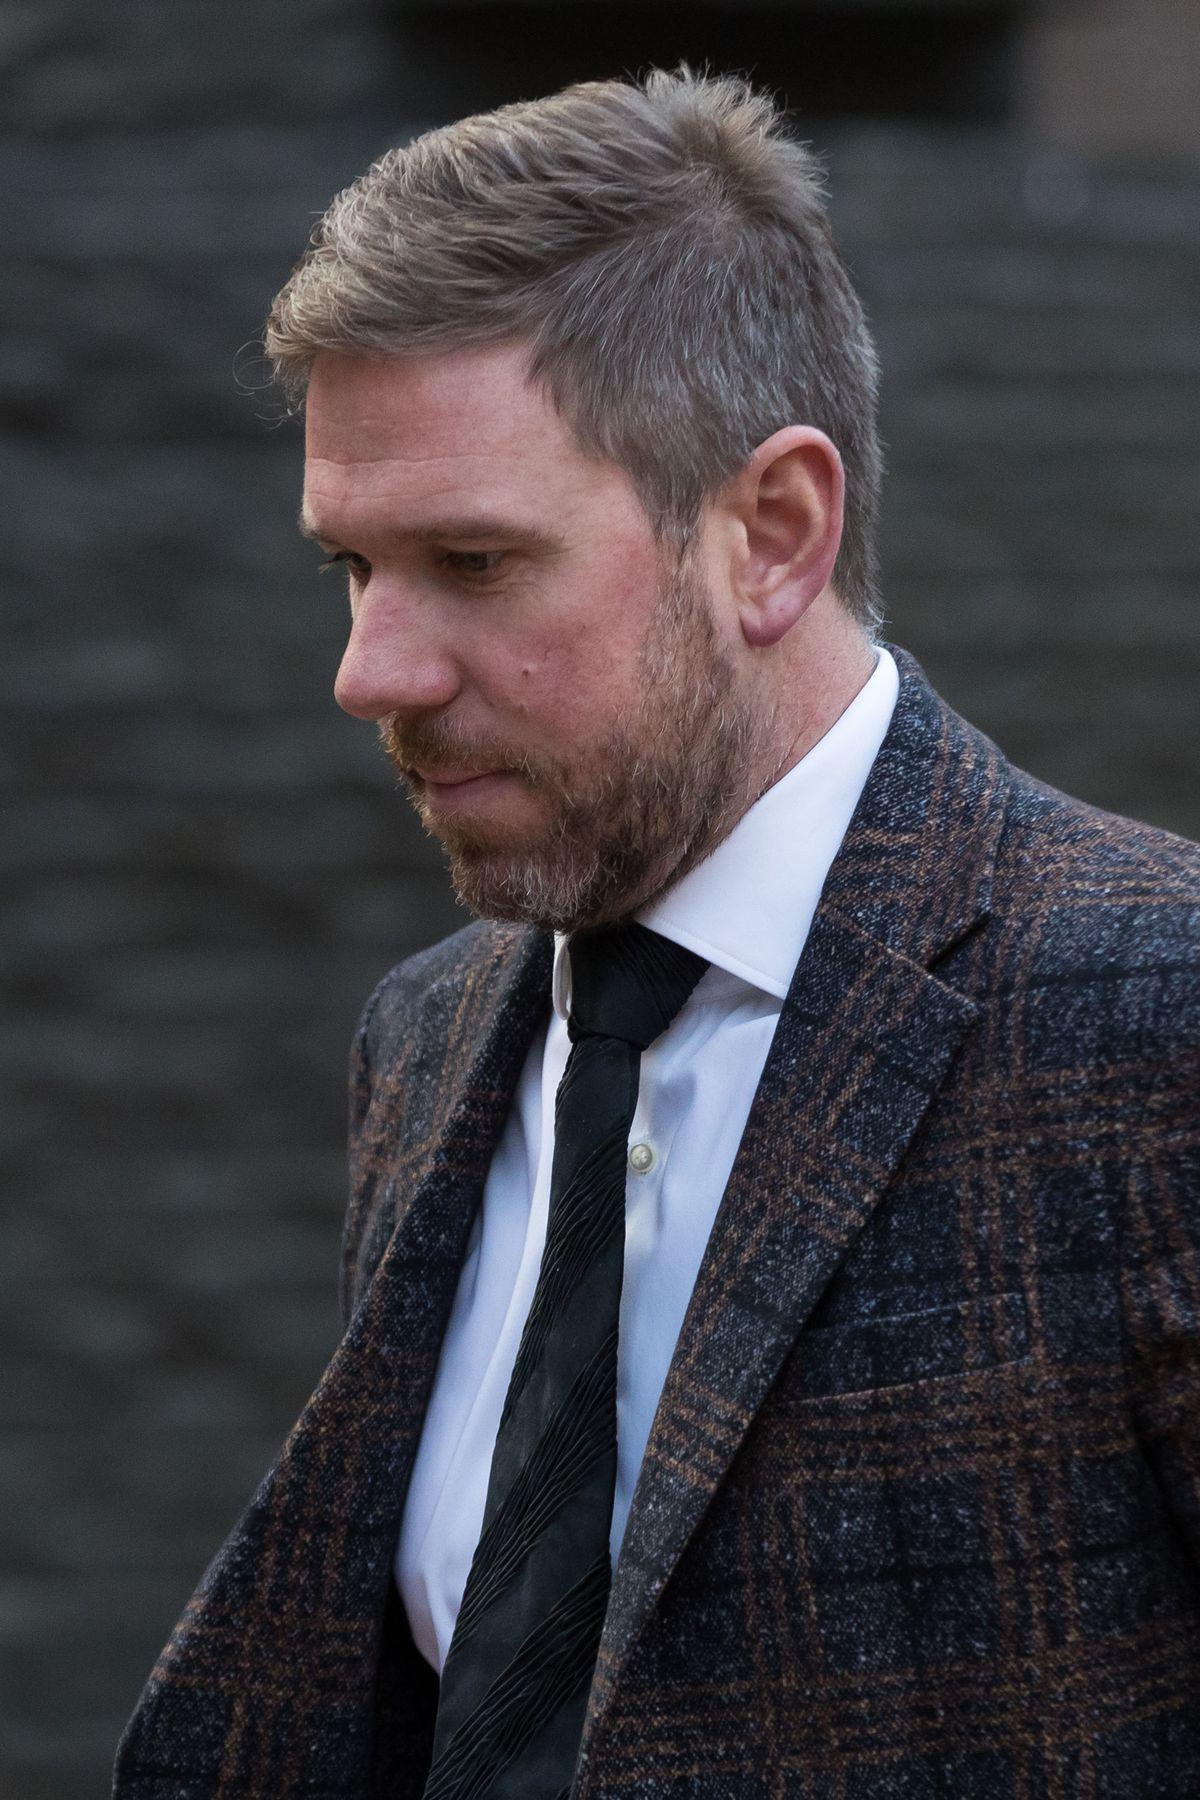 John Broadhurst arriving at Birmingham Crown Court for the trial